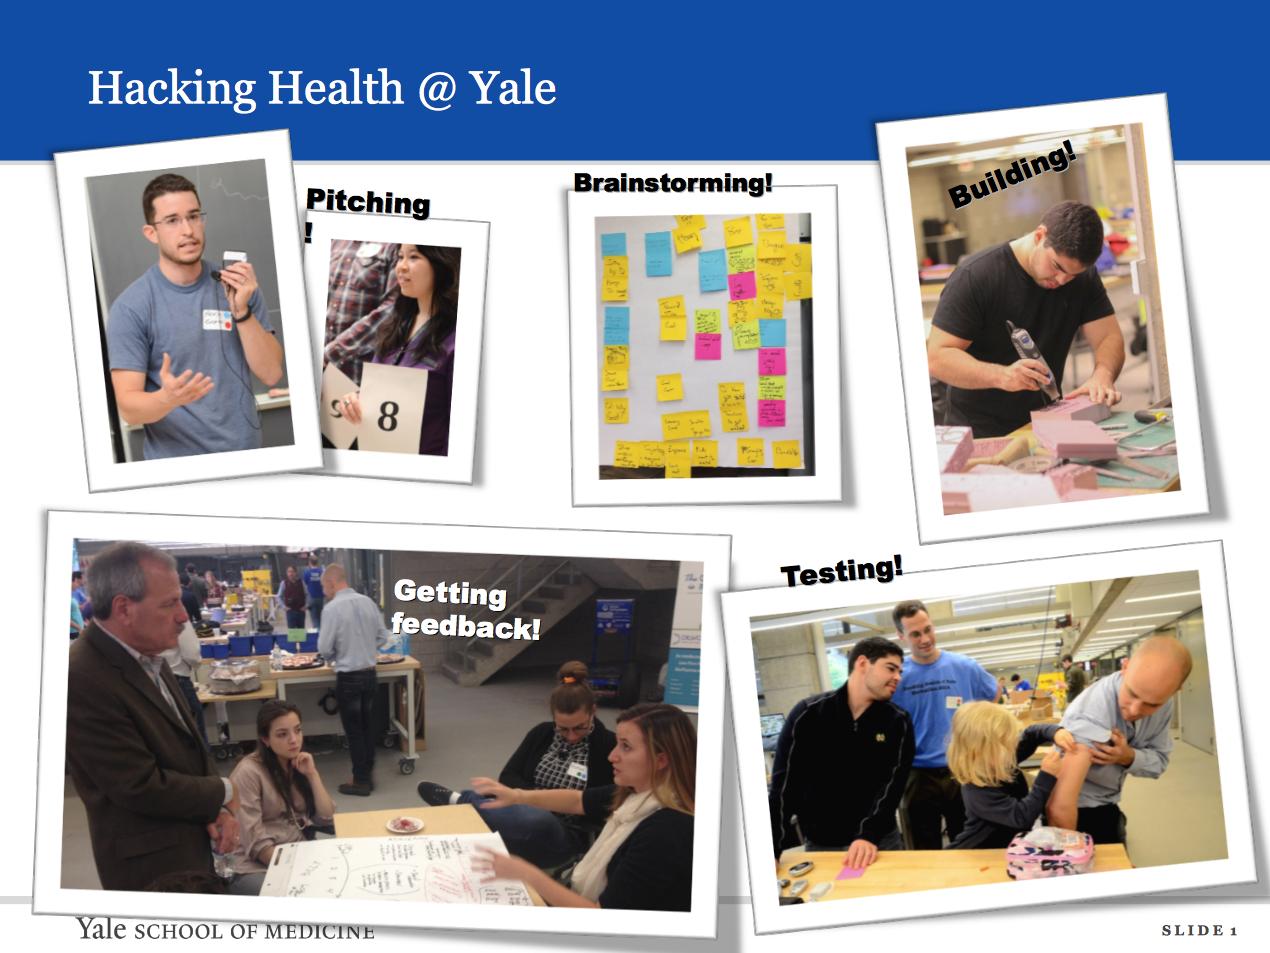 Hacking Health @ Yale.